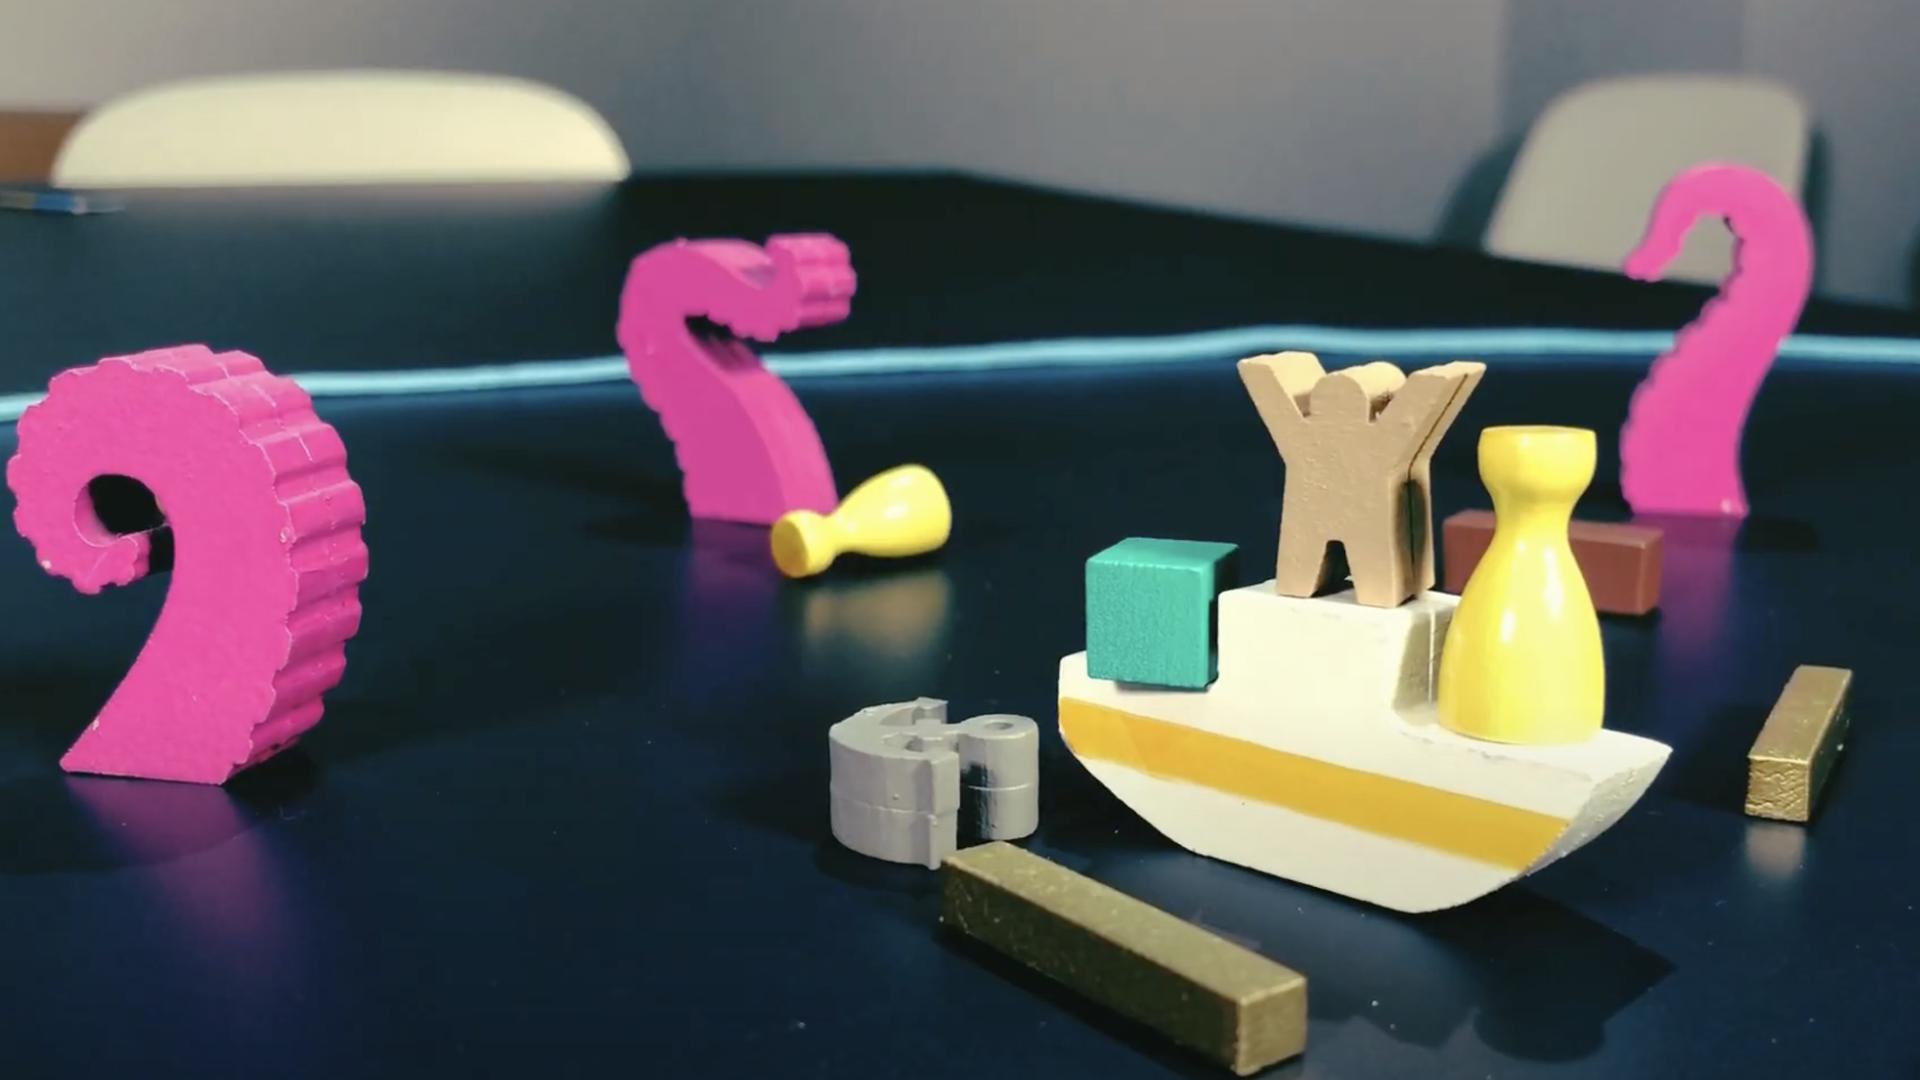 Crazy Octopus board game trailer screenshot